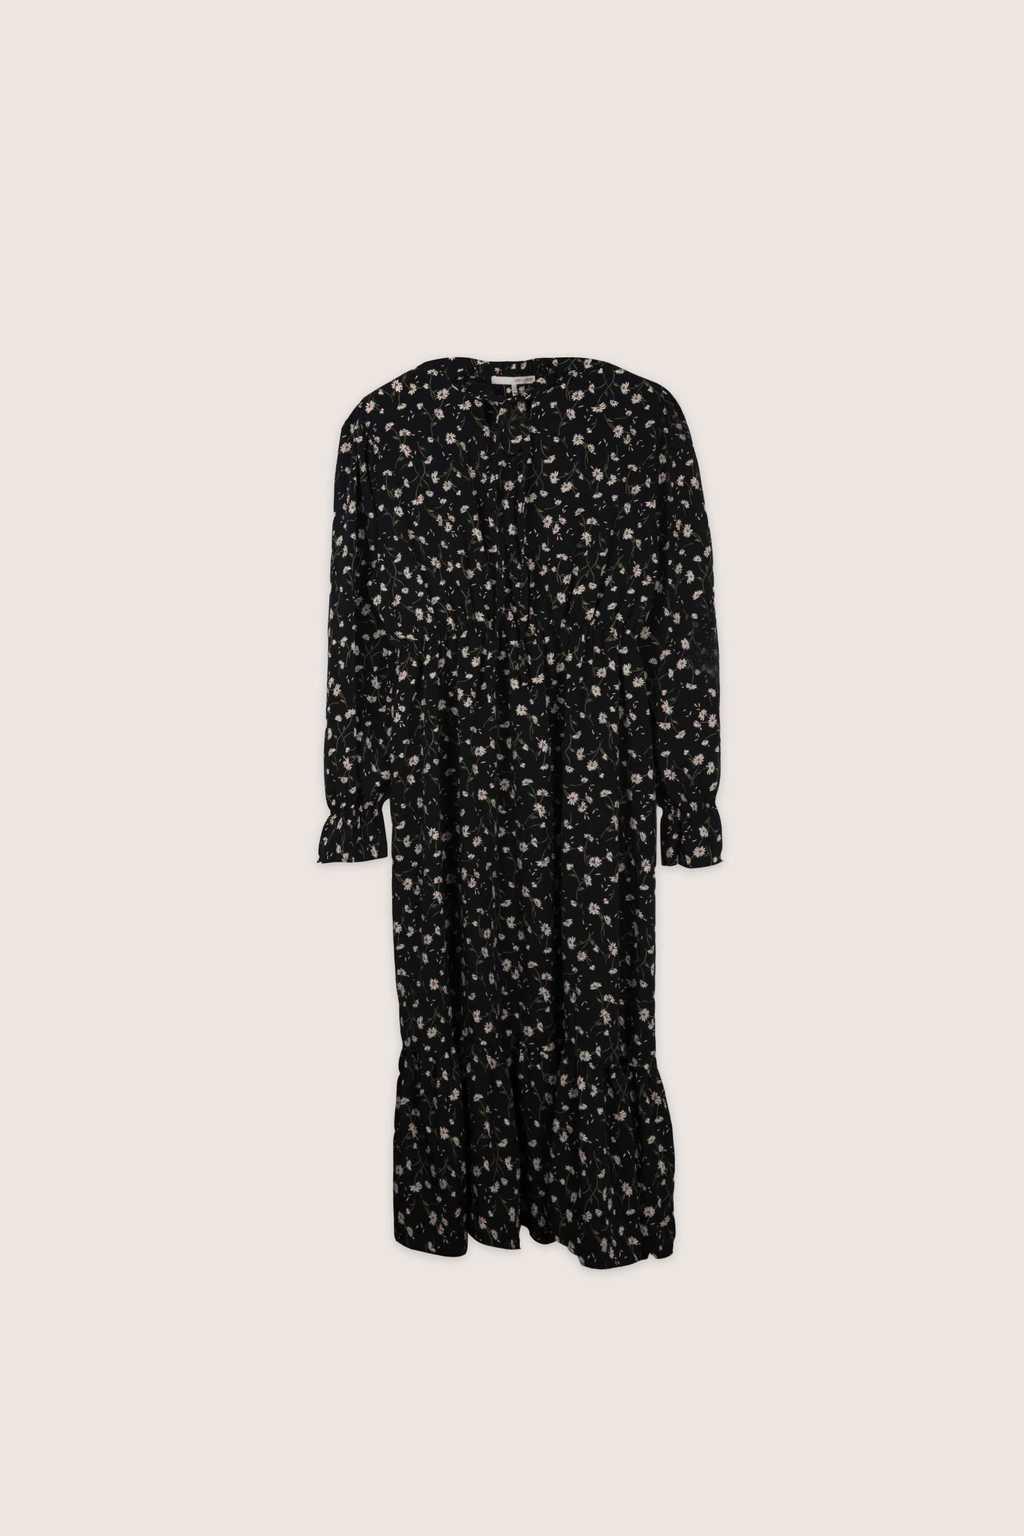 Dress H288 Black 7